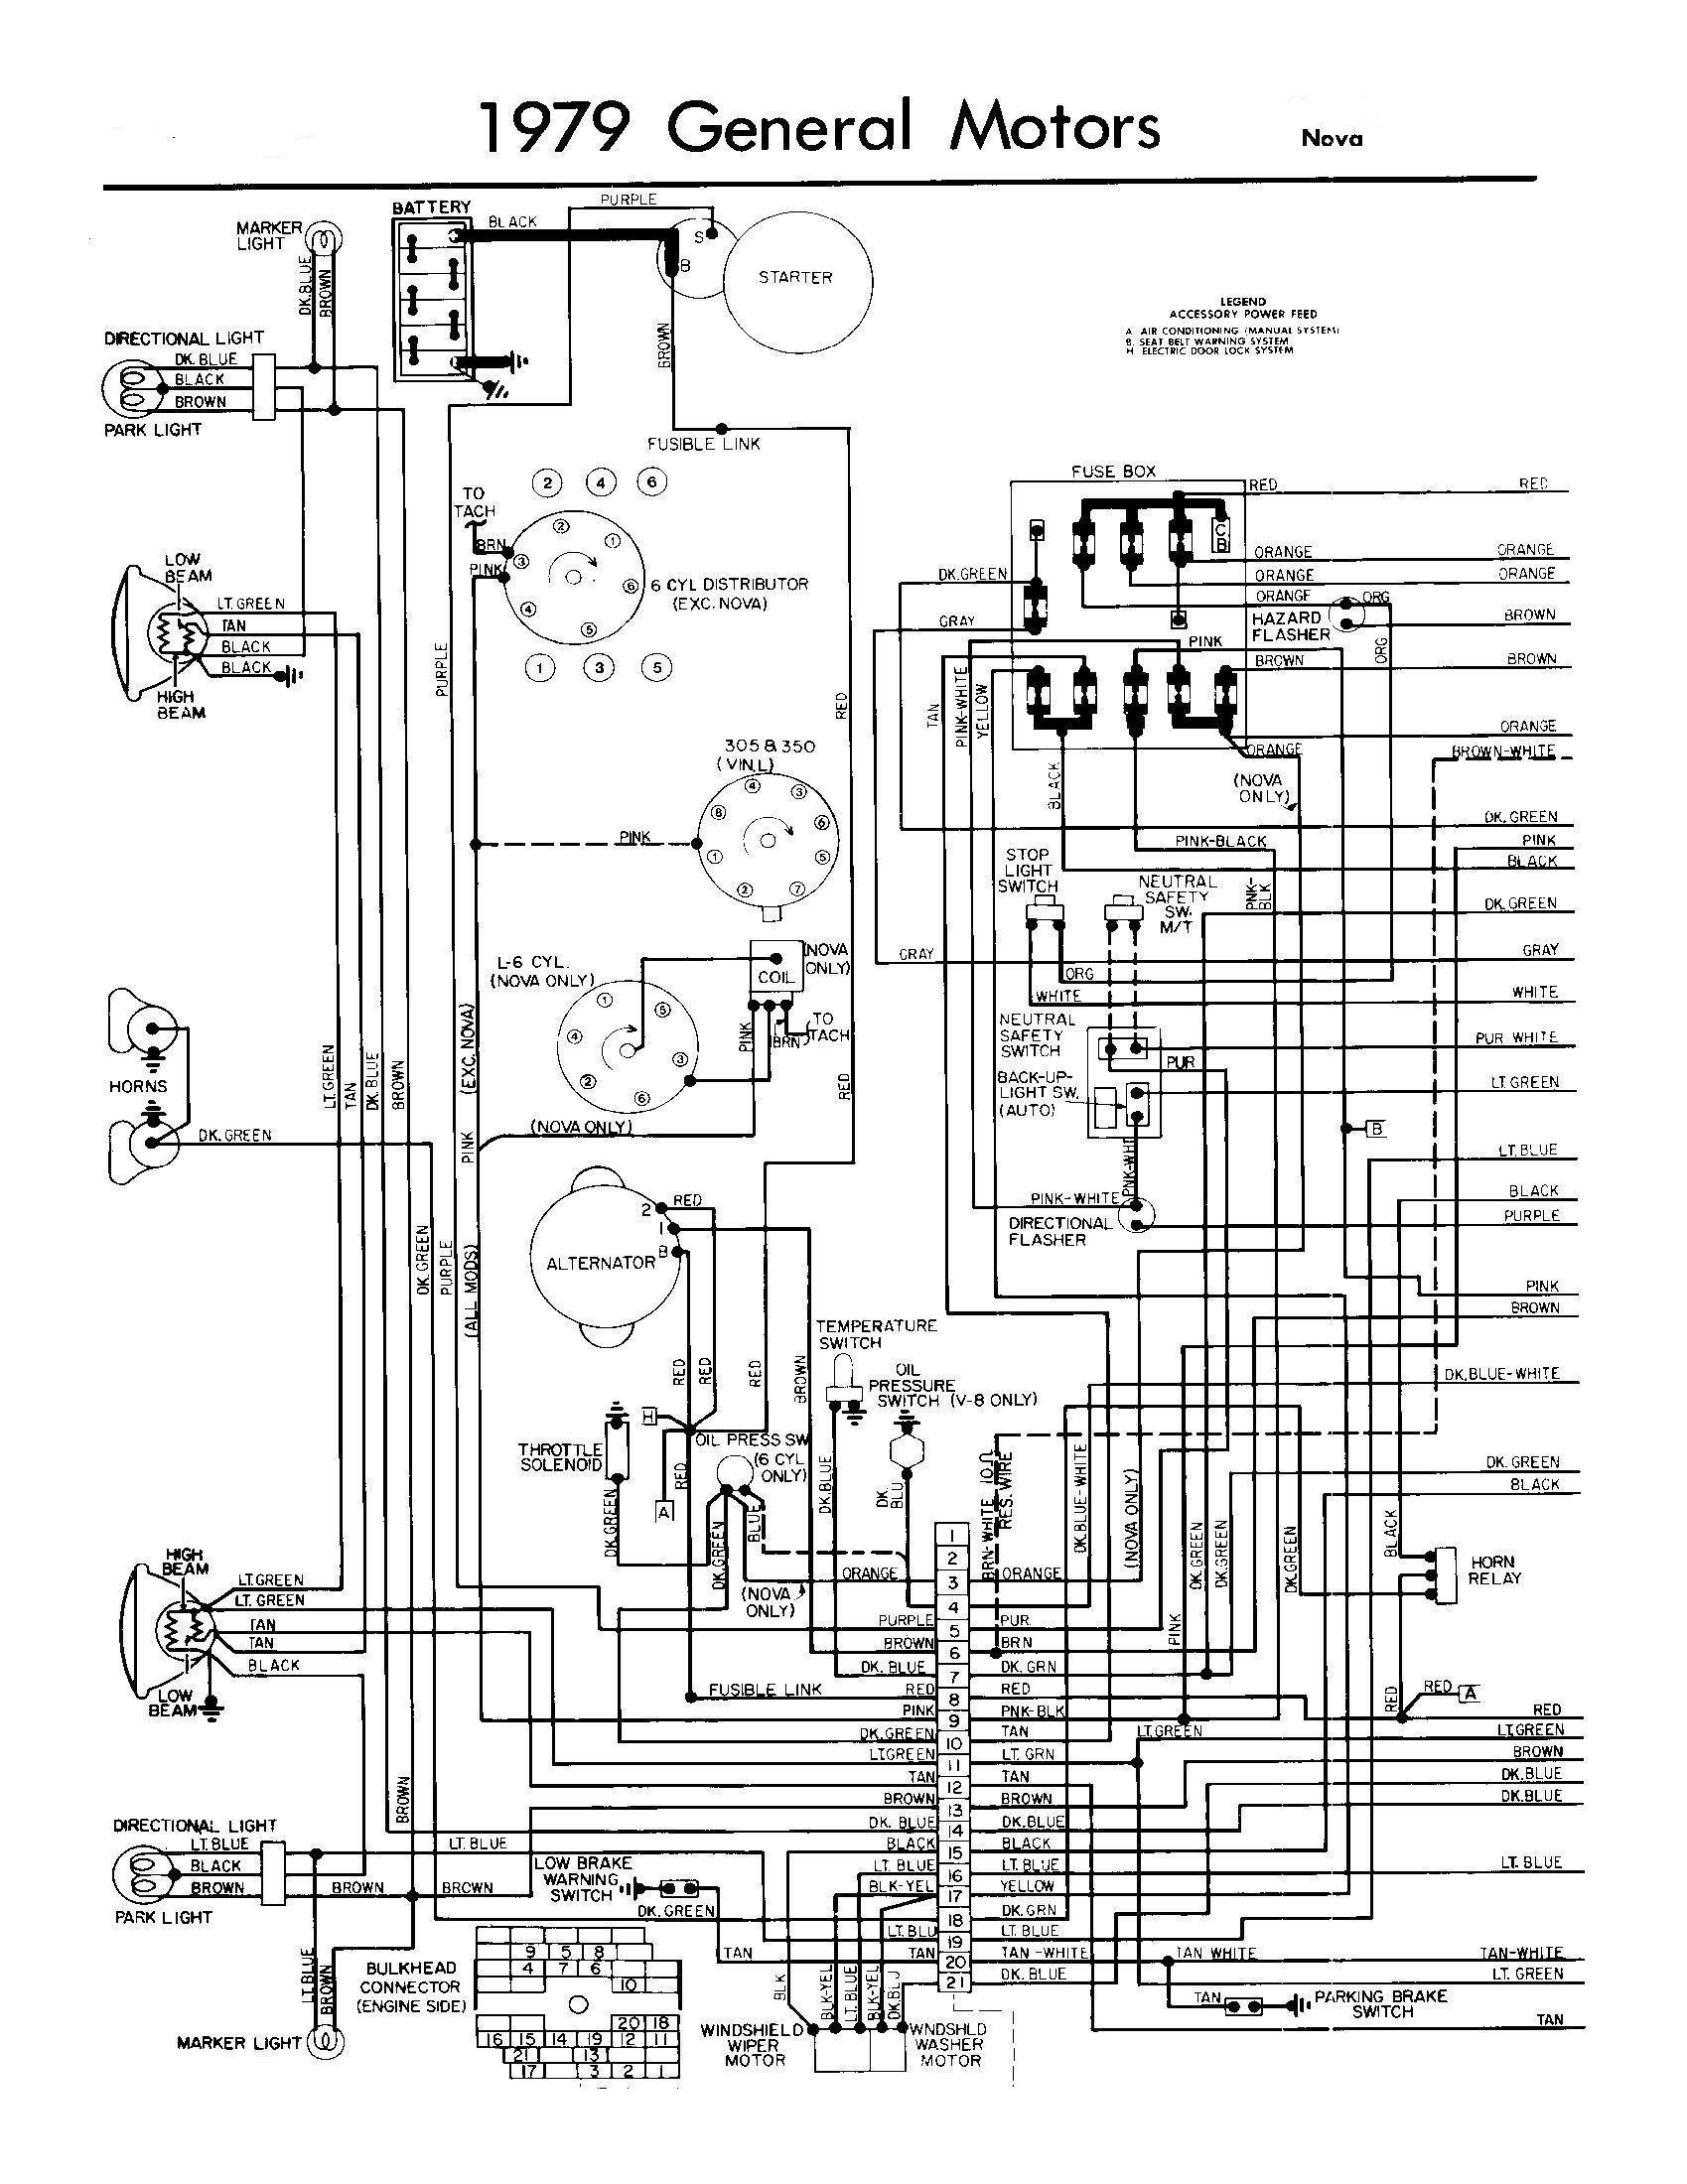 1988 Suzuki Samurai Wiring Diagram Sears Wiring Diagrams Of 1988 Suzuki Samurai Wiring Diagram